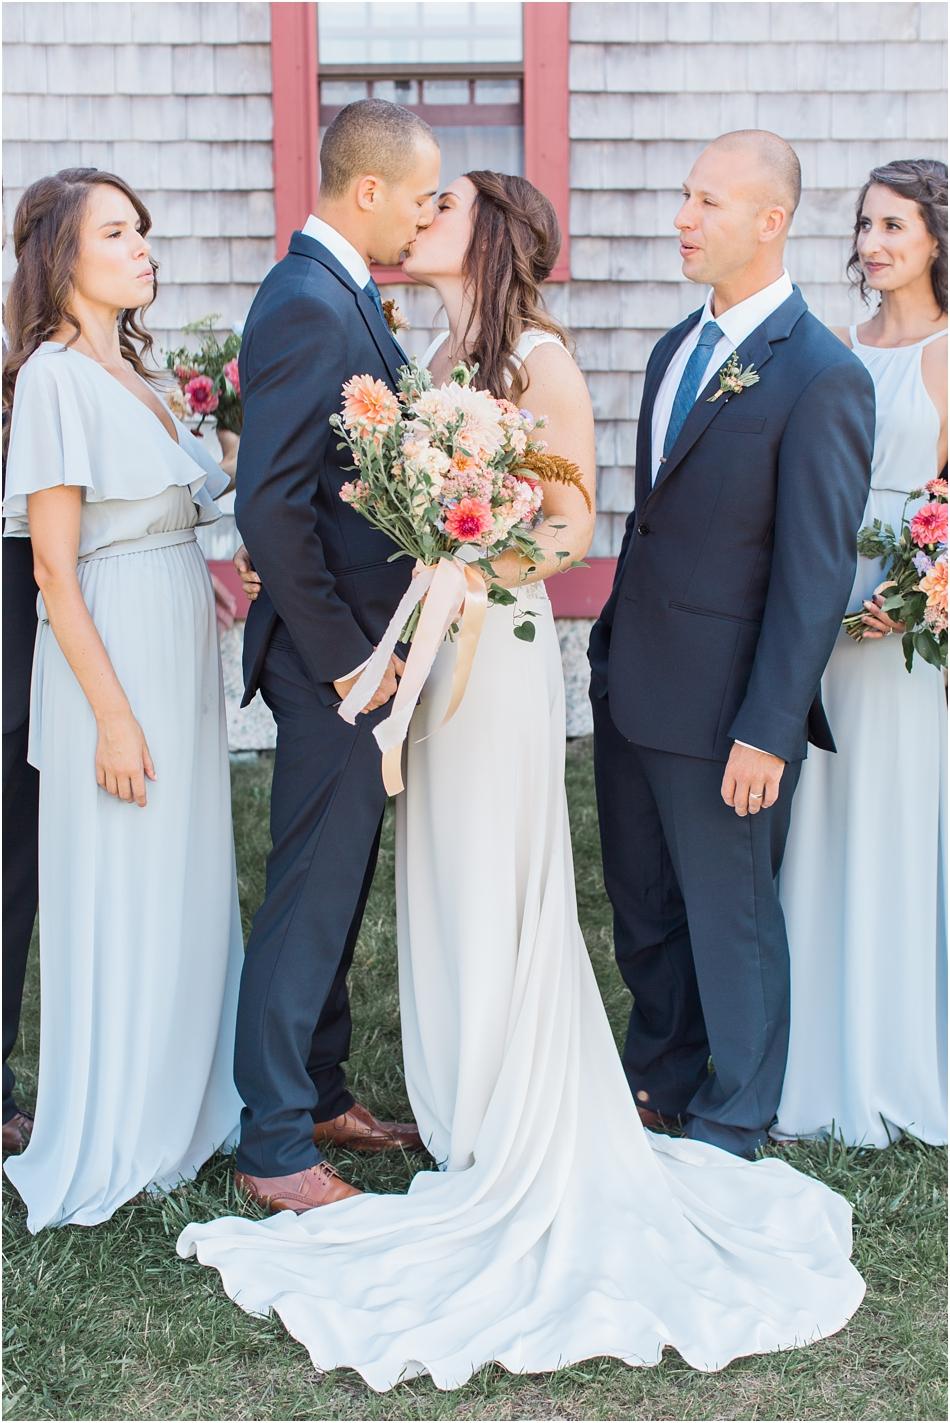 quissett_harbor_house_tented_caity_joe_cape_cod_boston_new_england_wedding_photographer_Meredith_Jane_Photography_photo_2519.jpg